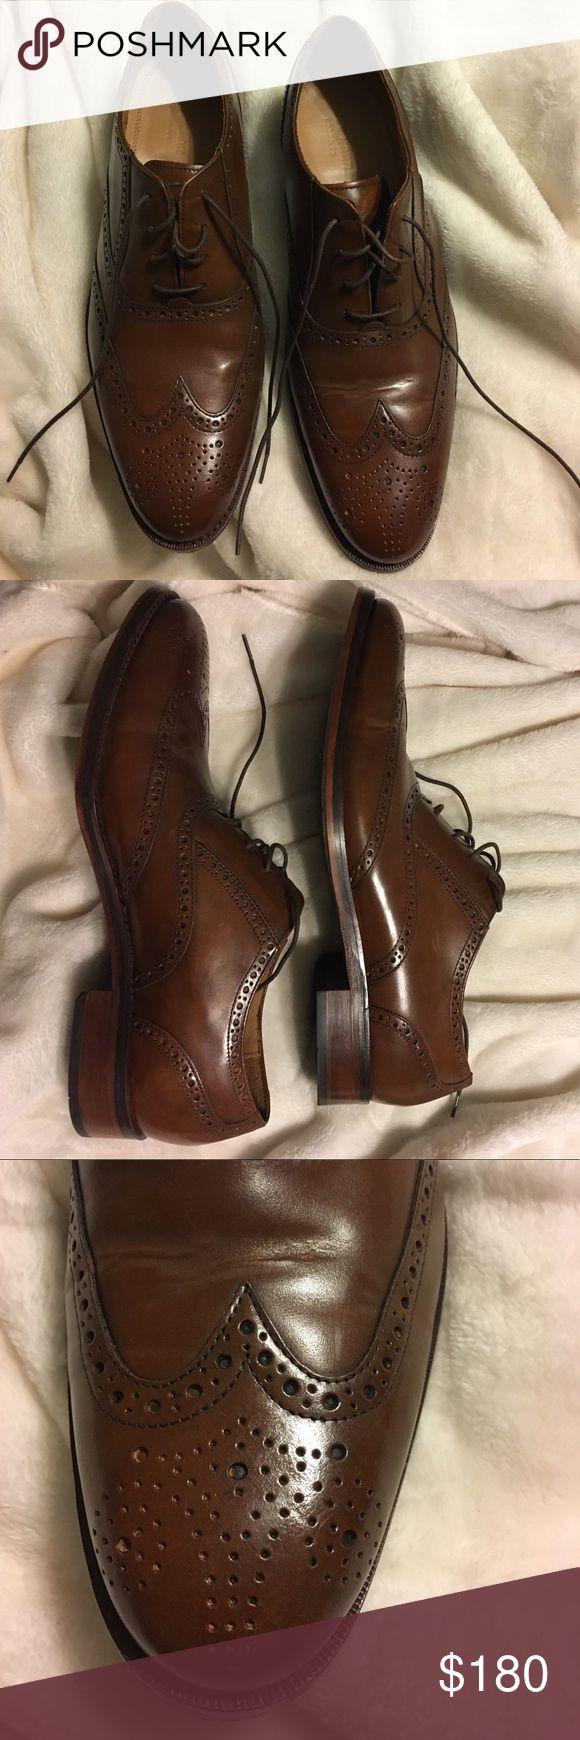 Cole Haan Outlet grandrevølution men's 11.5 oxford Worn twice, like new. Men's 11 1/2 Cole Haan wingtip oxfords. Brown leather. Cole Haan Shoes Oxfords & Derbys